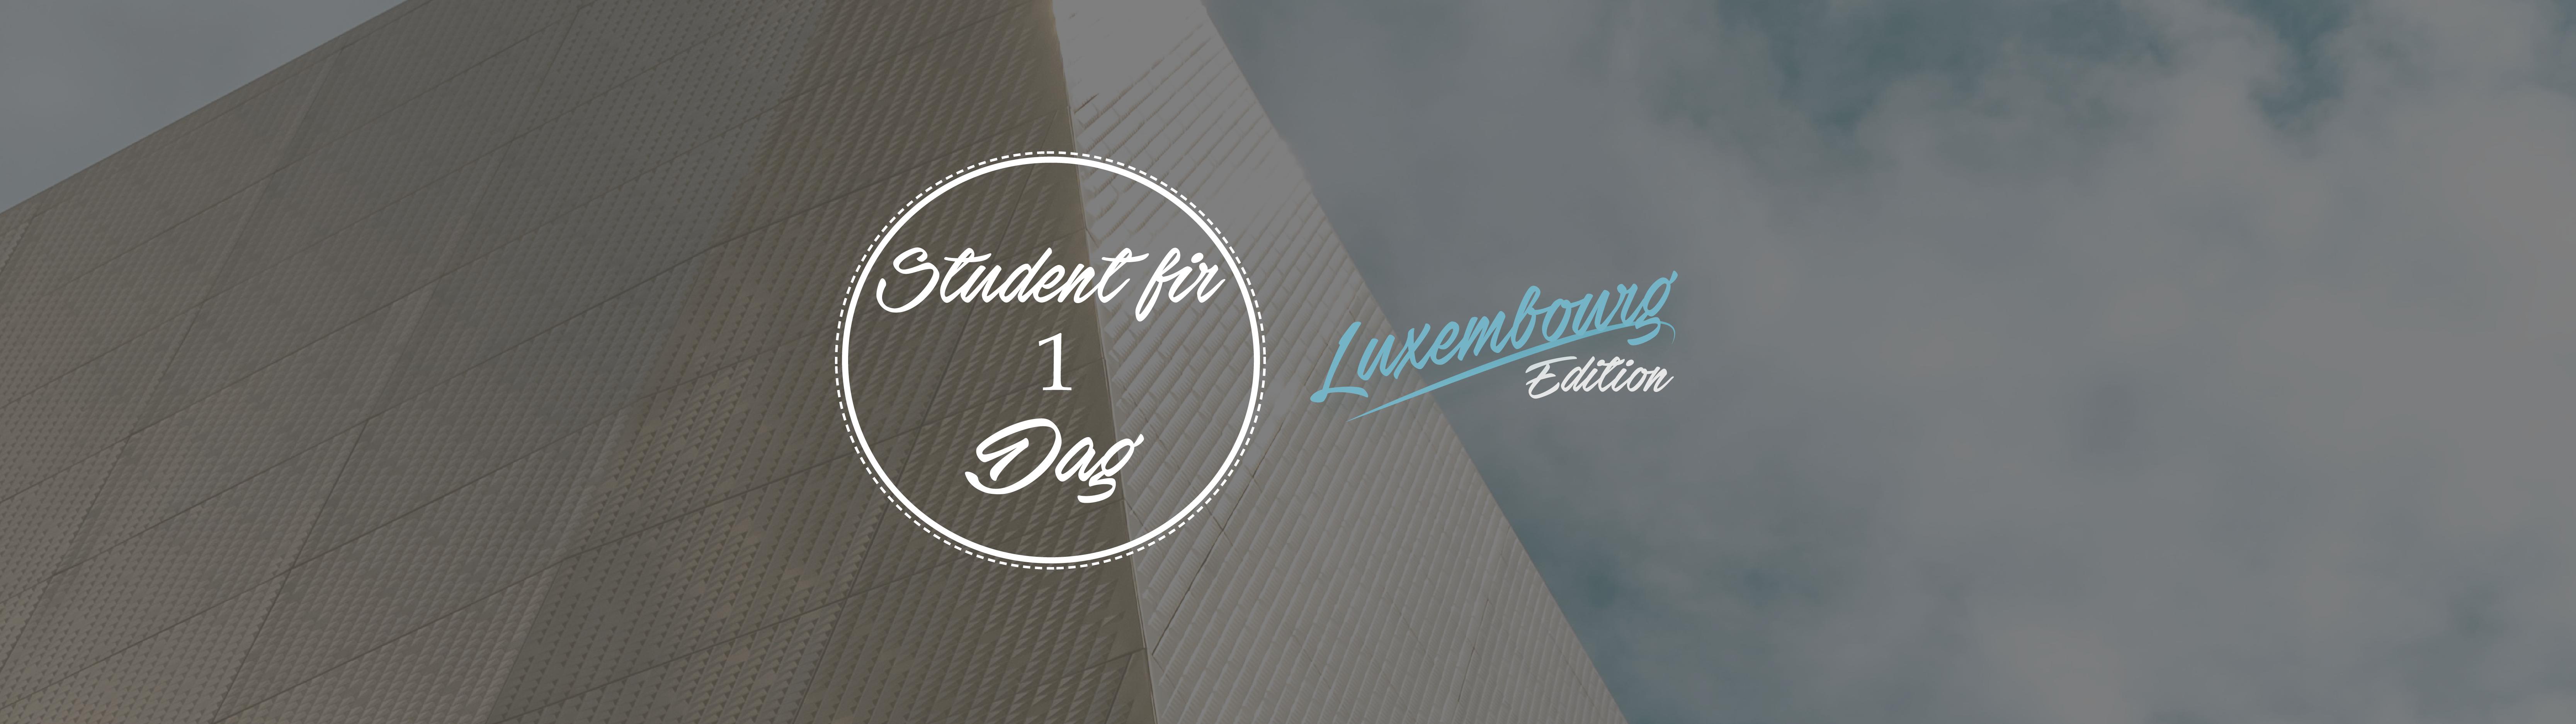 Student fir 1 Dag – Luxembourg Edition